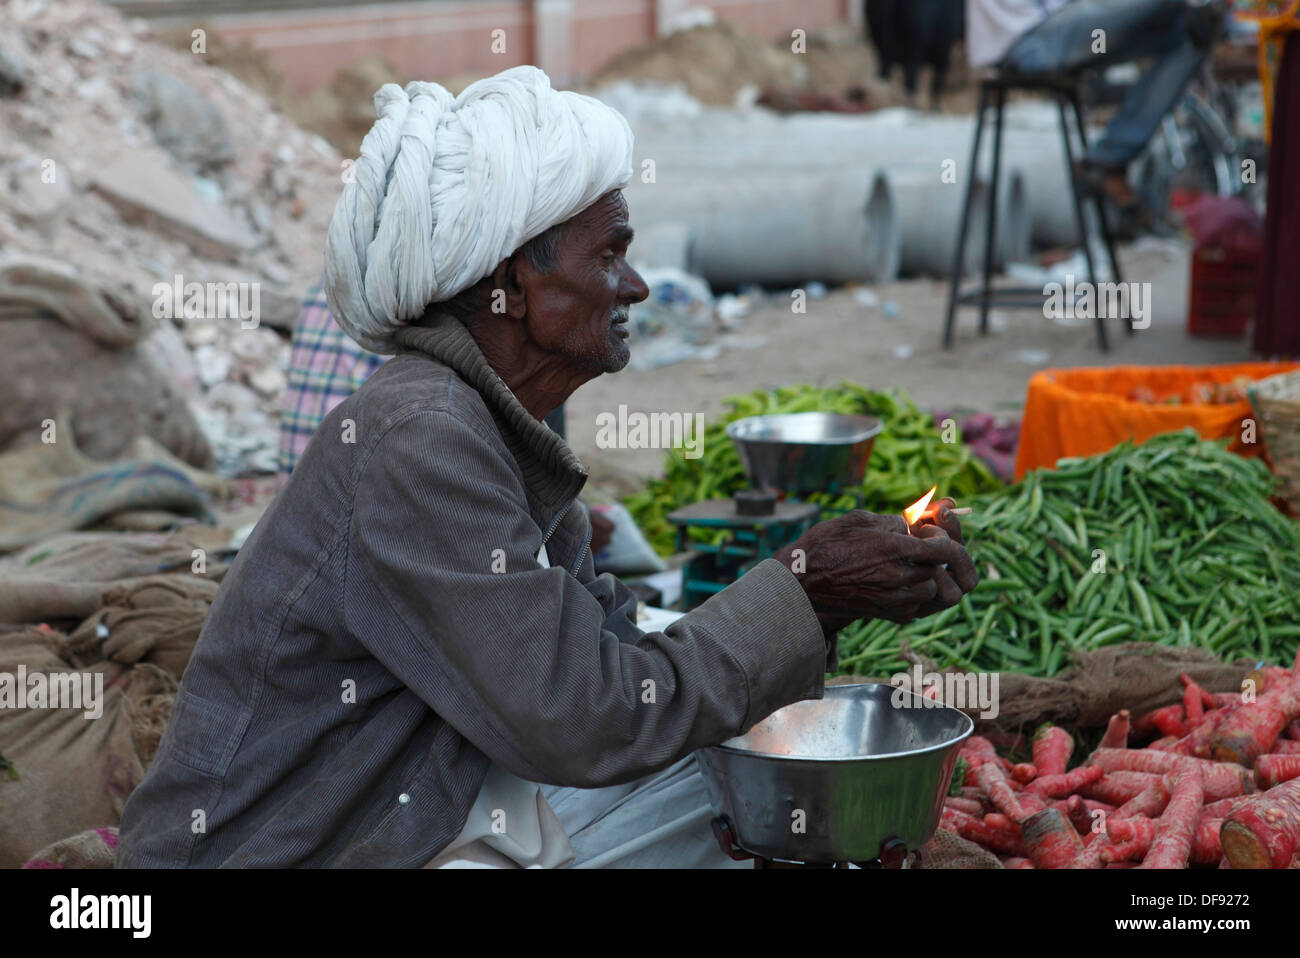 Old vegetable salesman lighting up a cigarette in a market in Jaipur, Rajasthan,India. - Stock Image